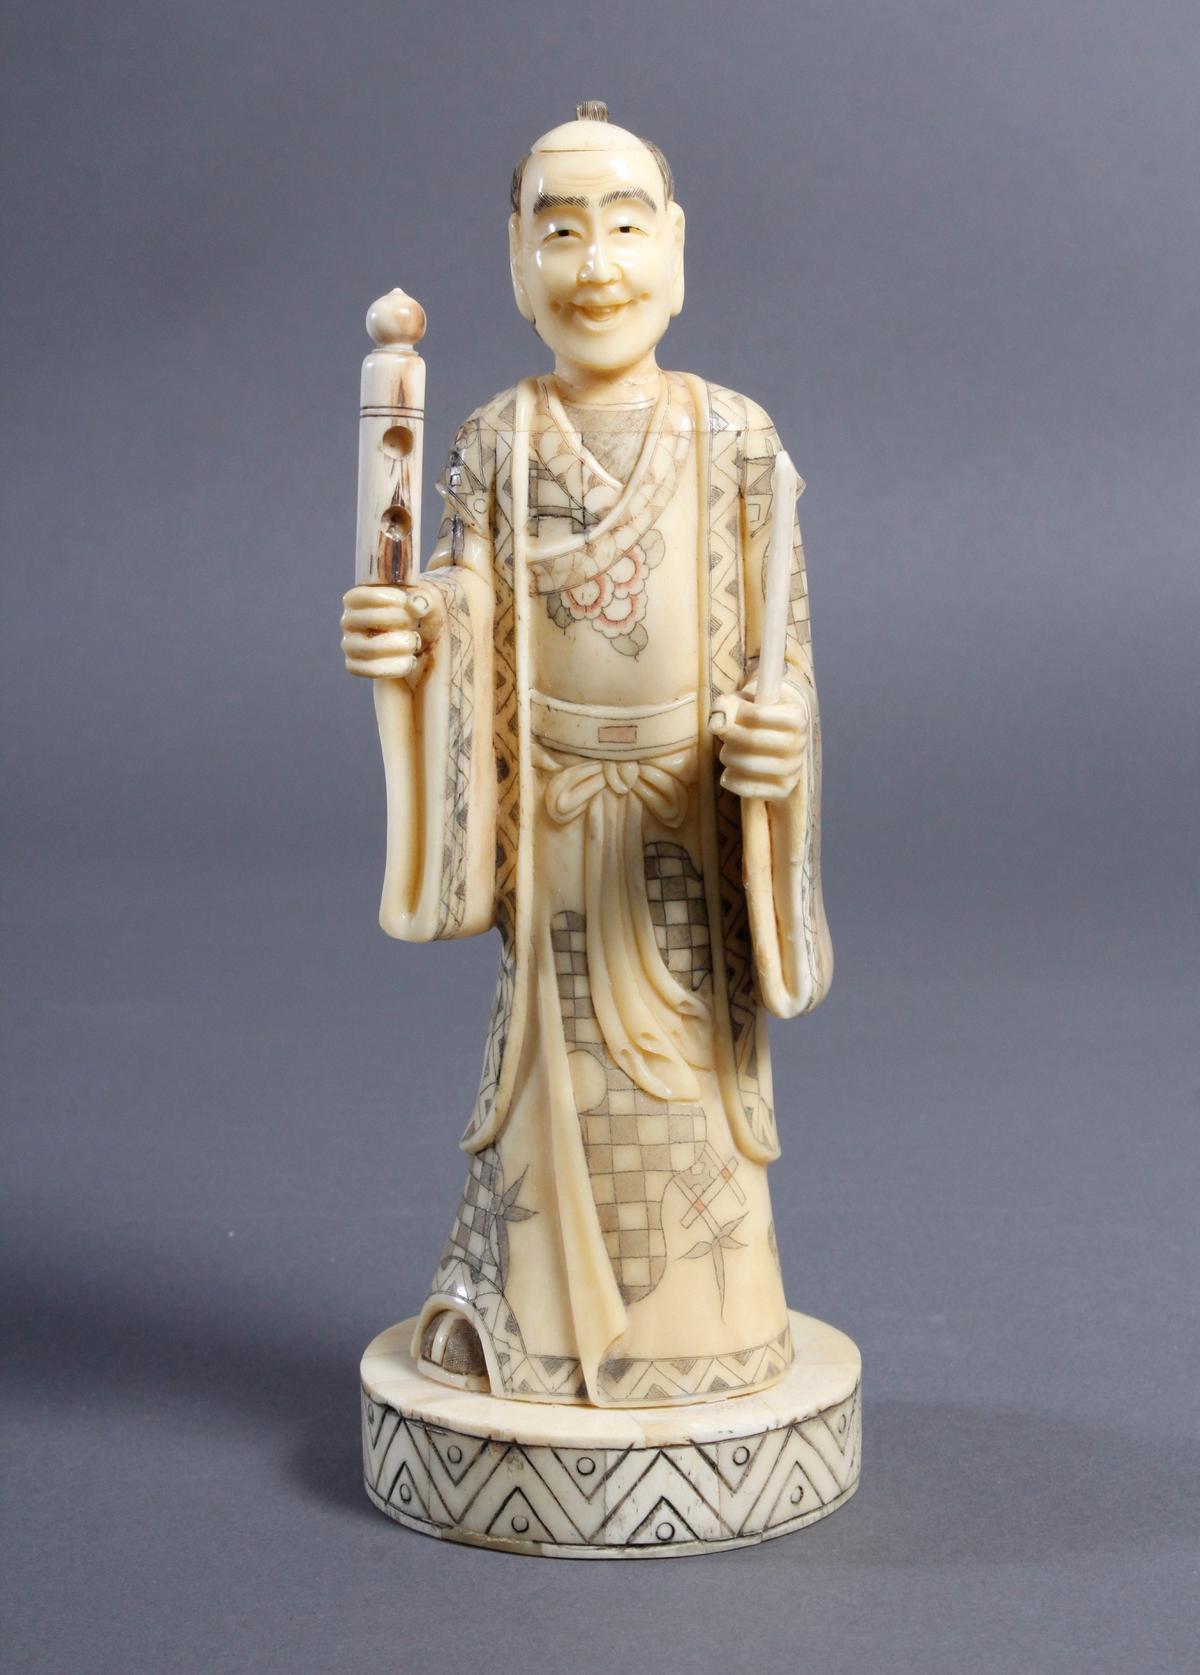 Beinfigur Japan, 1. Hälfte 20. Jahrhundert